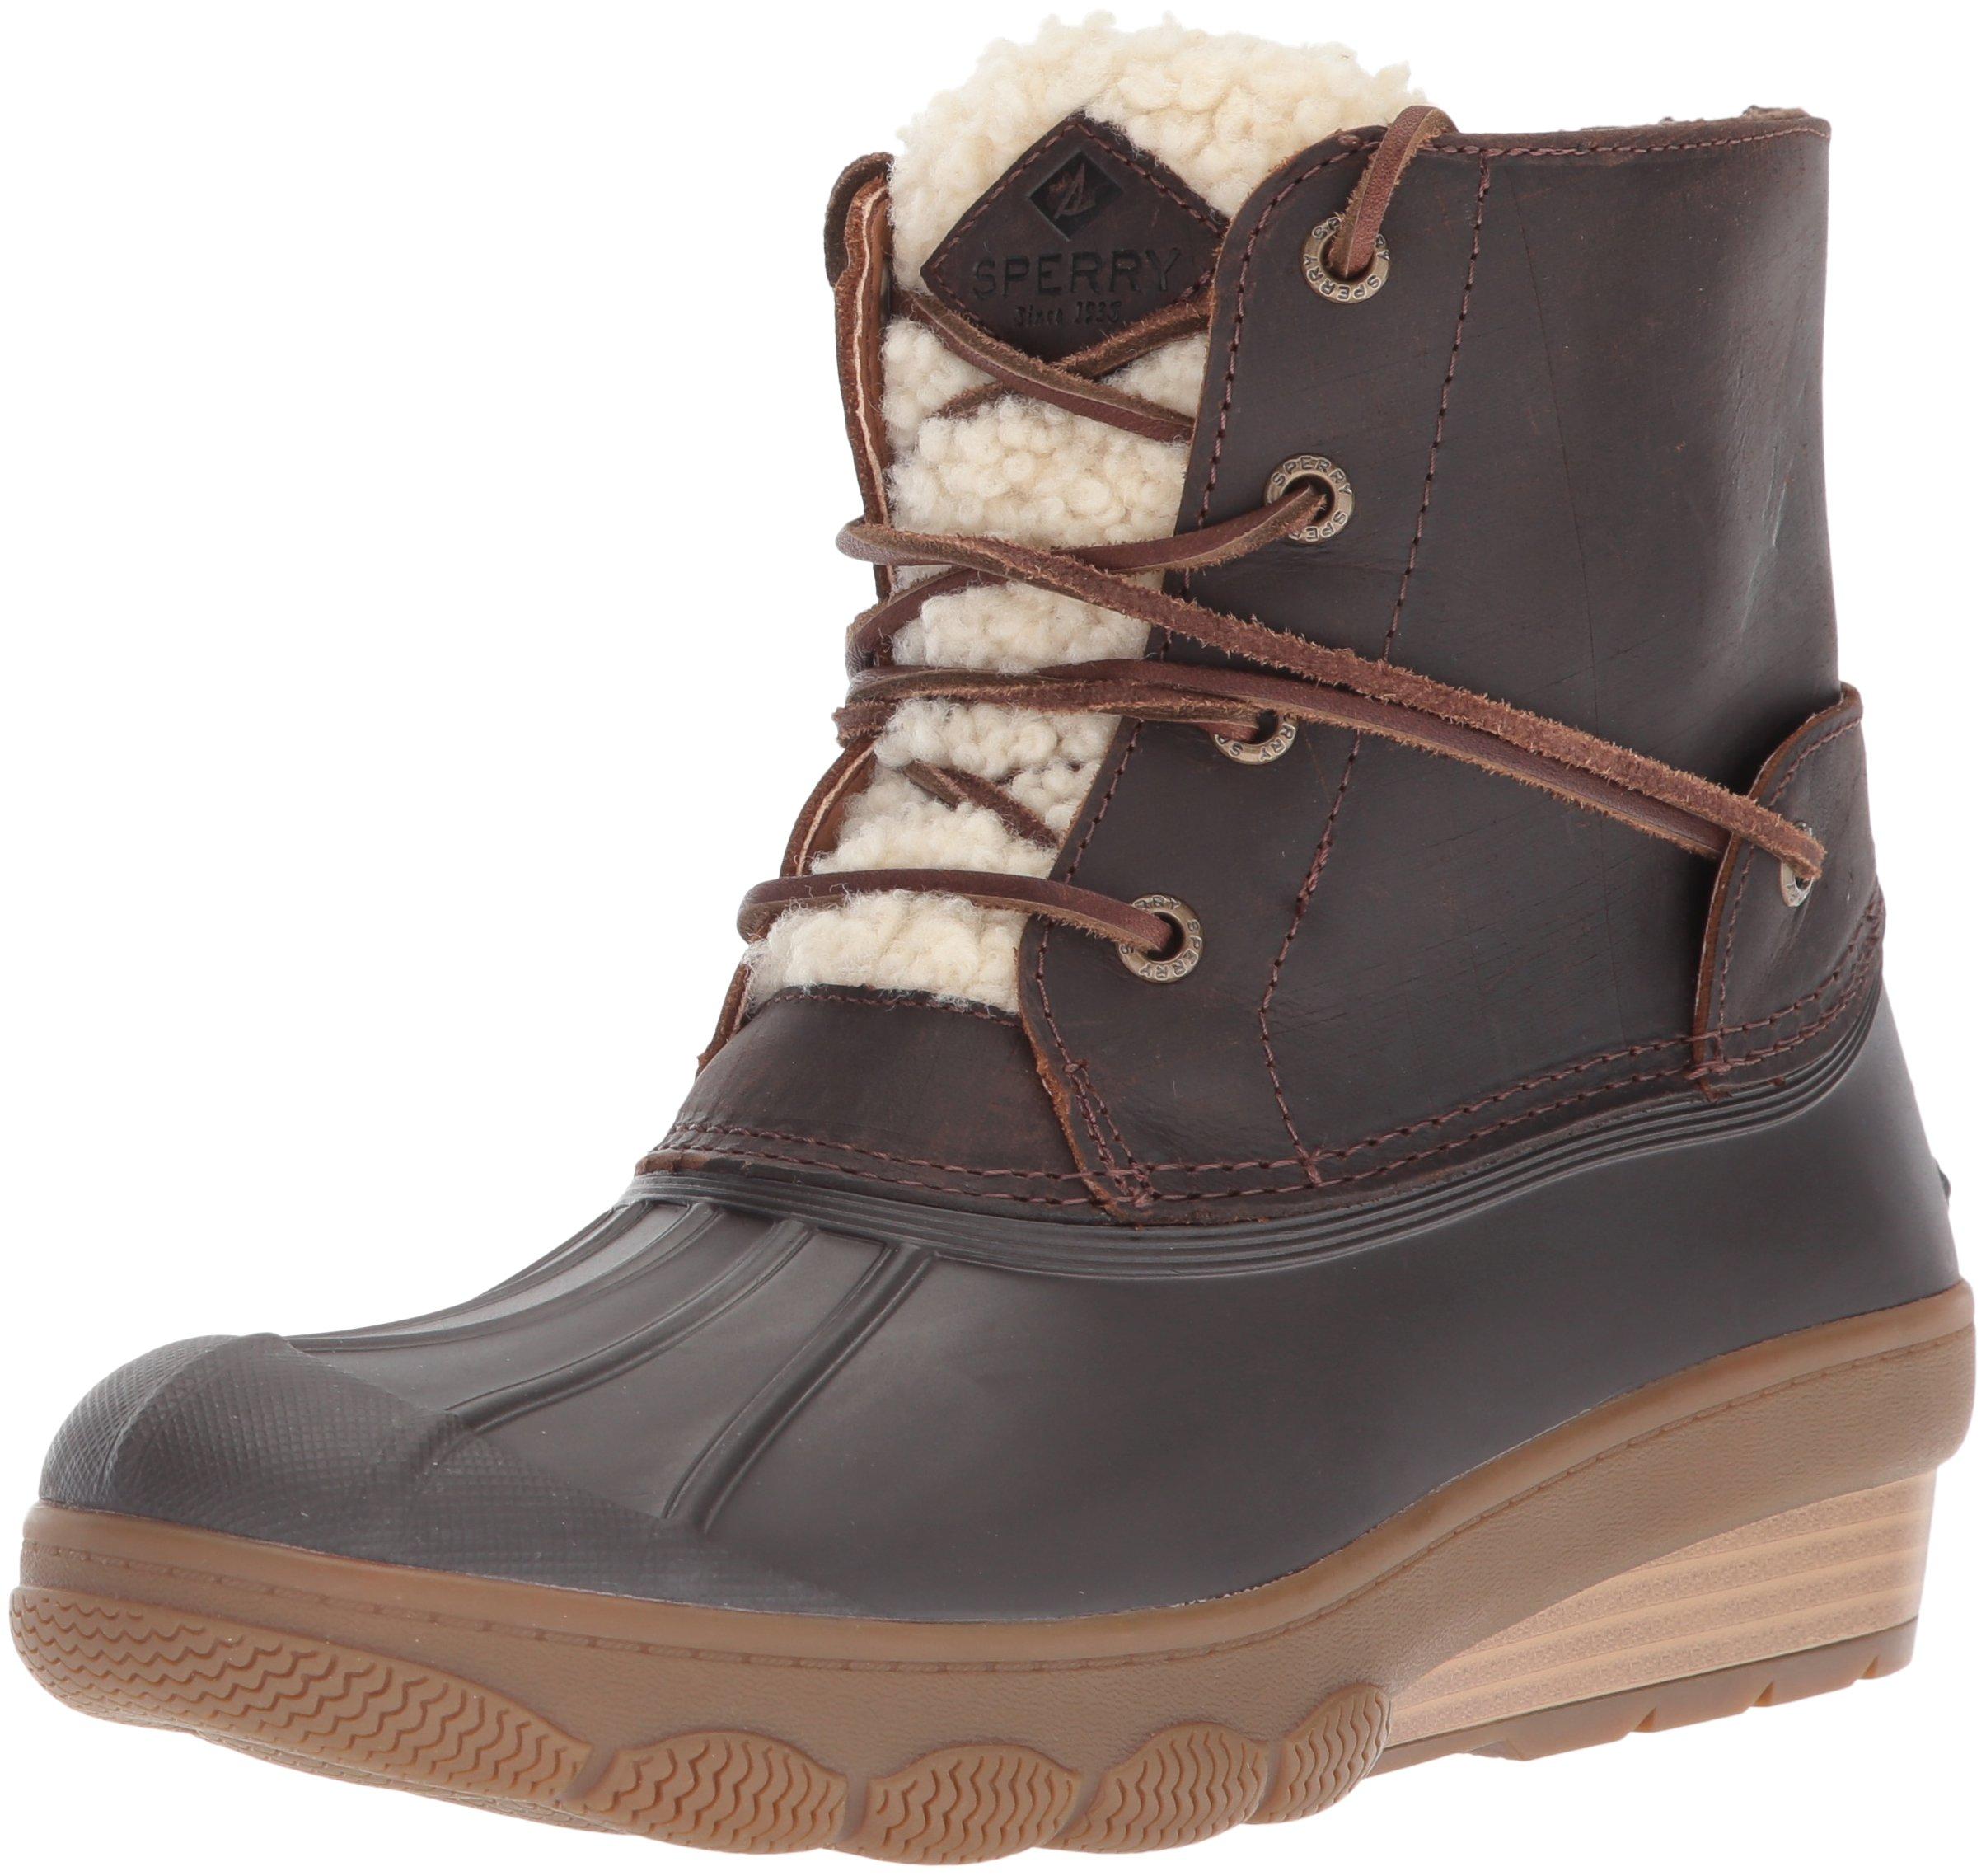 Sperry Top-Sider Women's Saltwater Wedge Tide Fur Rain Boot, Brown, 5 Medium US